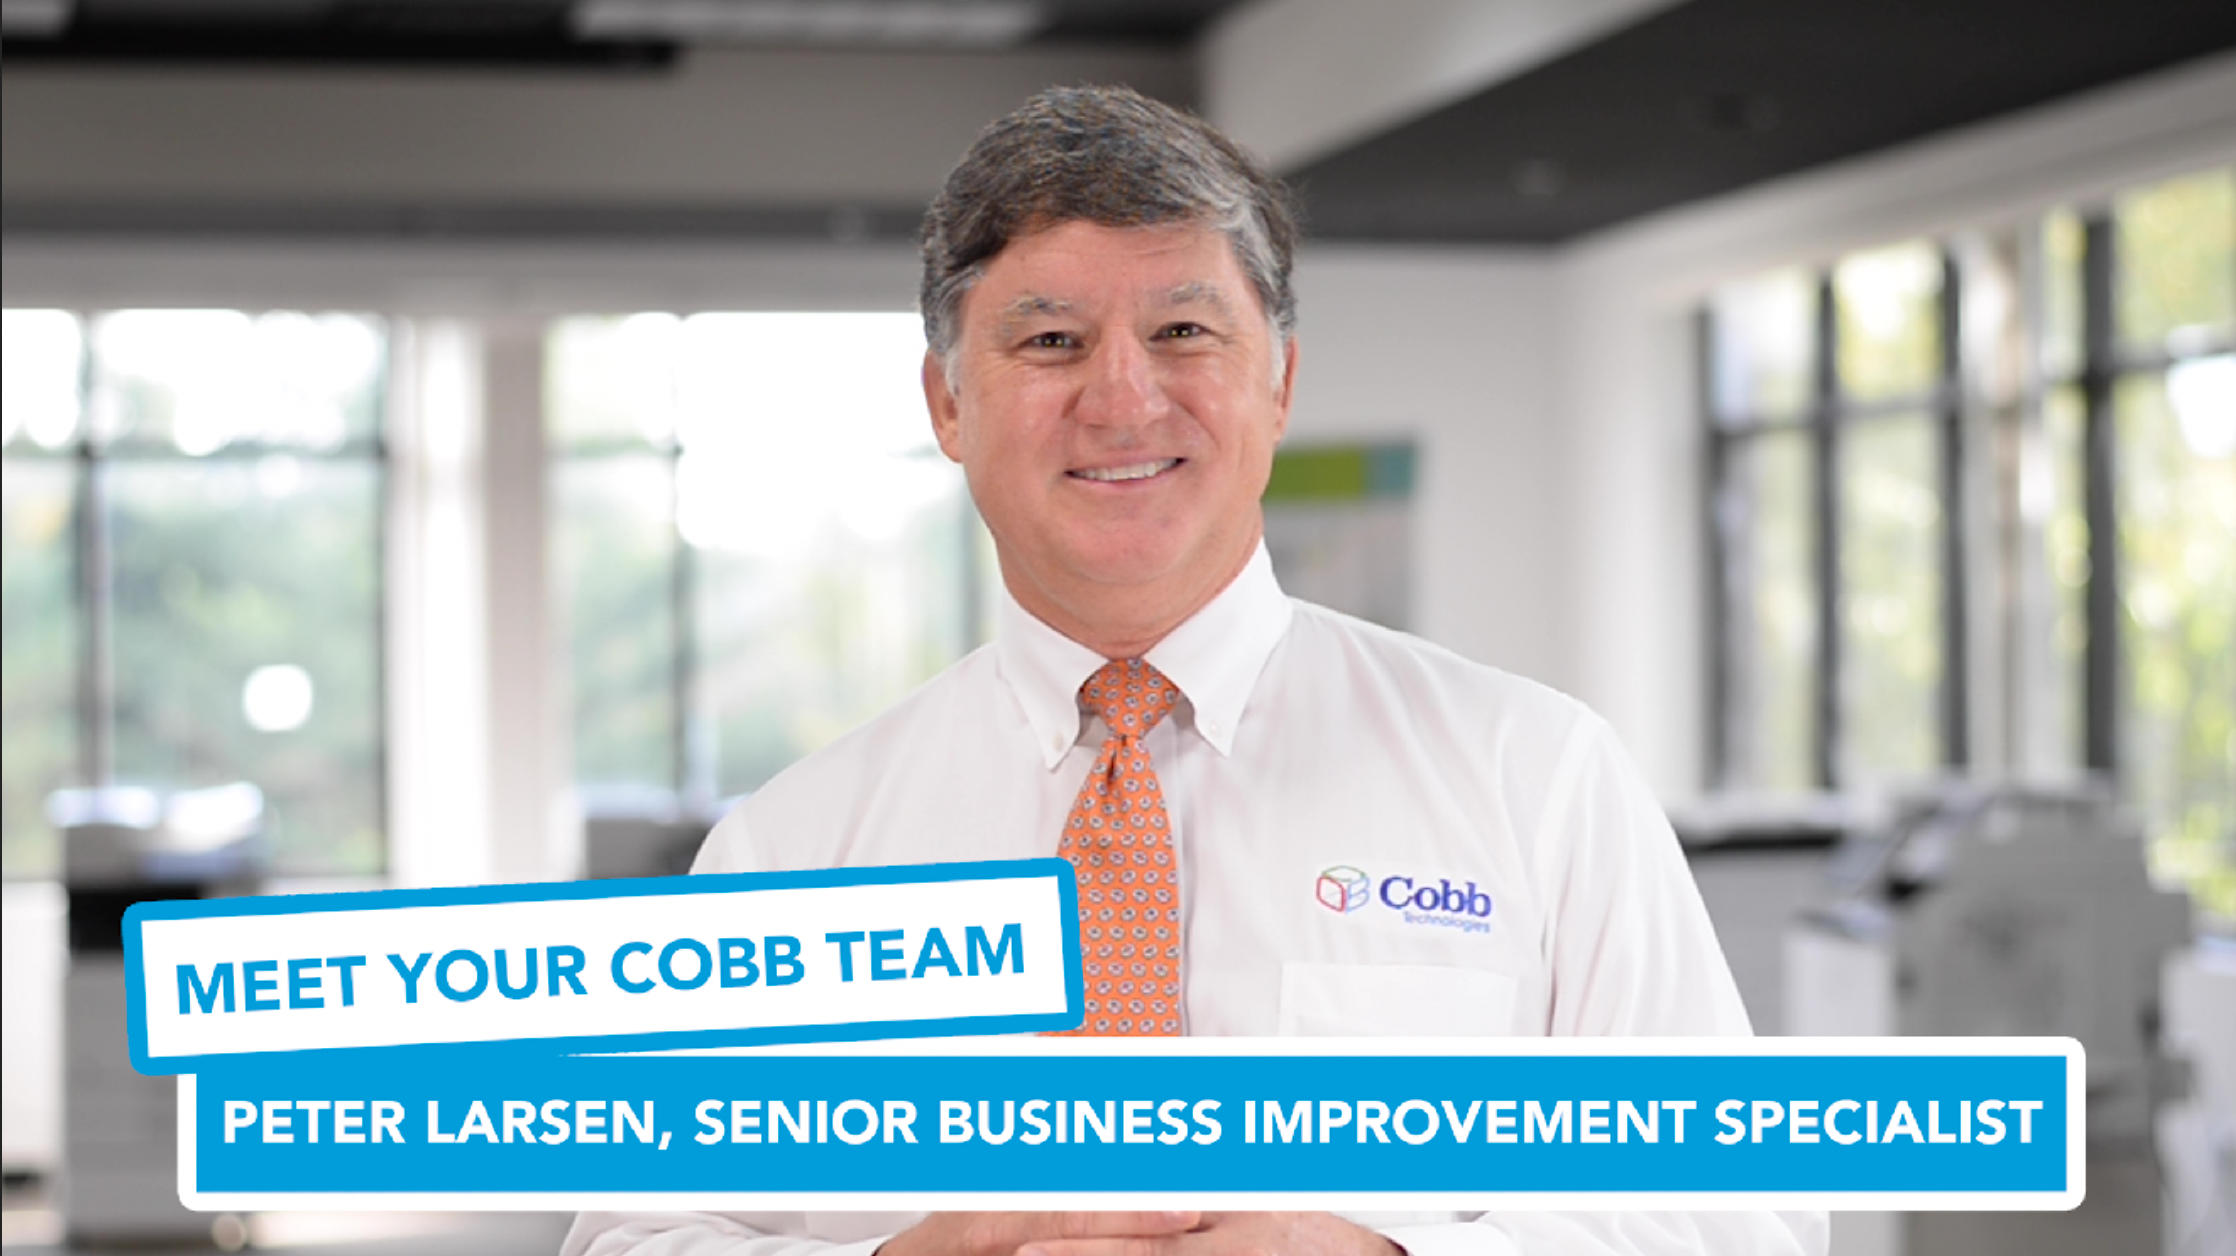 Meet Your Cobb Team: Peter Larsen, Senior Business Improvement Specialist